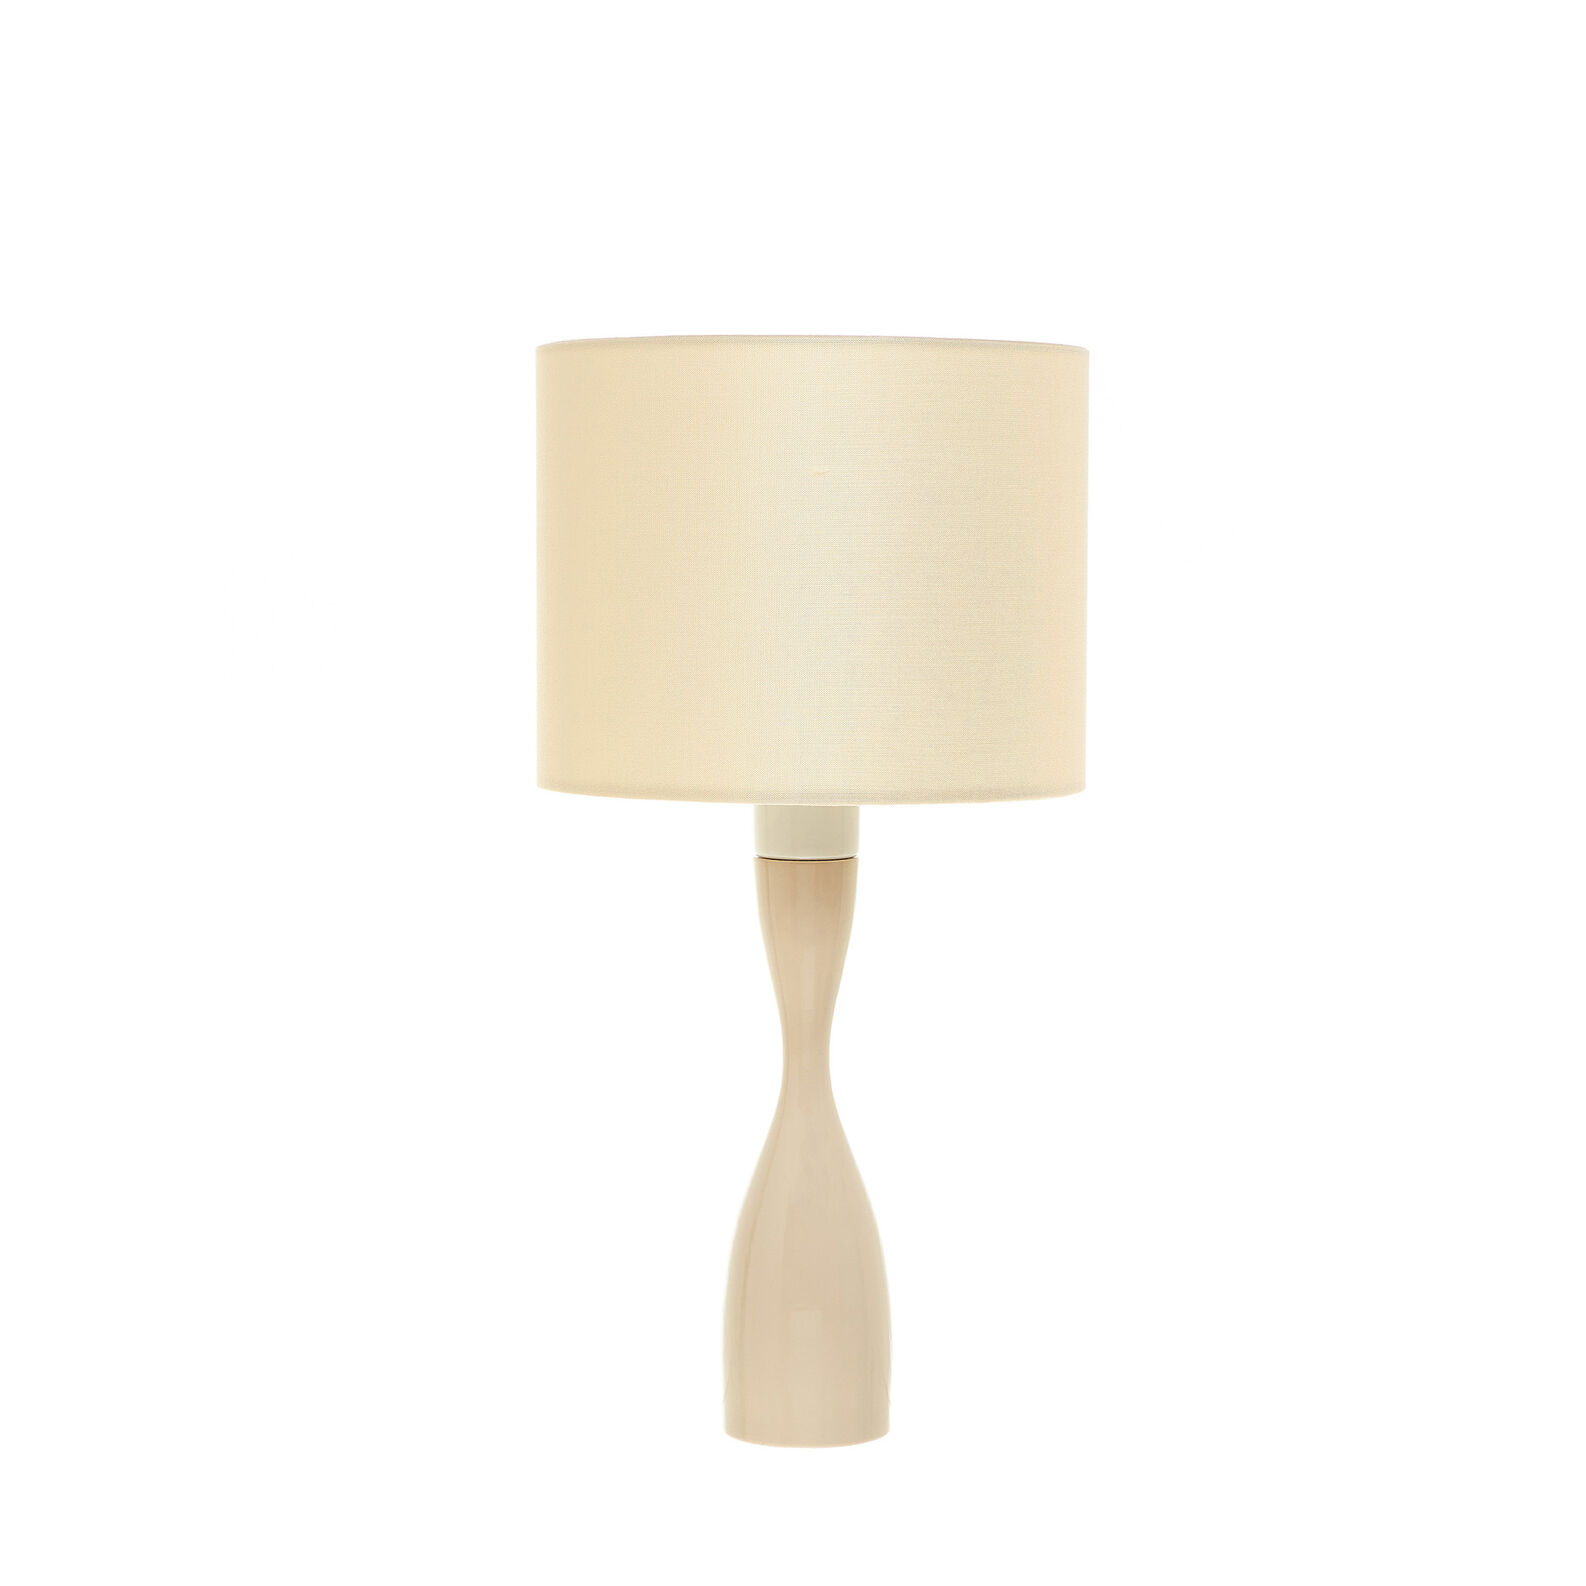 Clelia table lamp